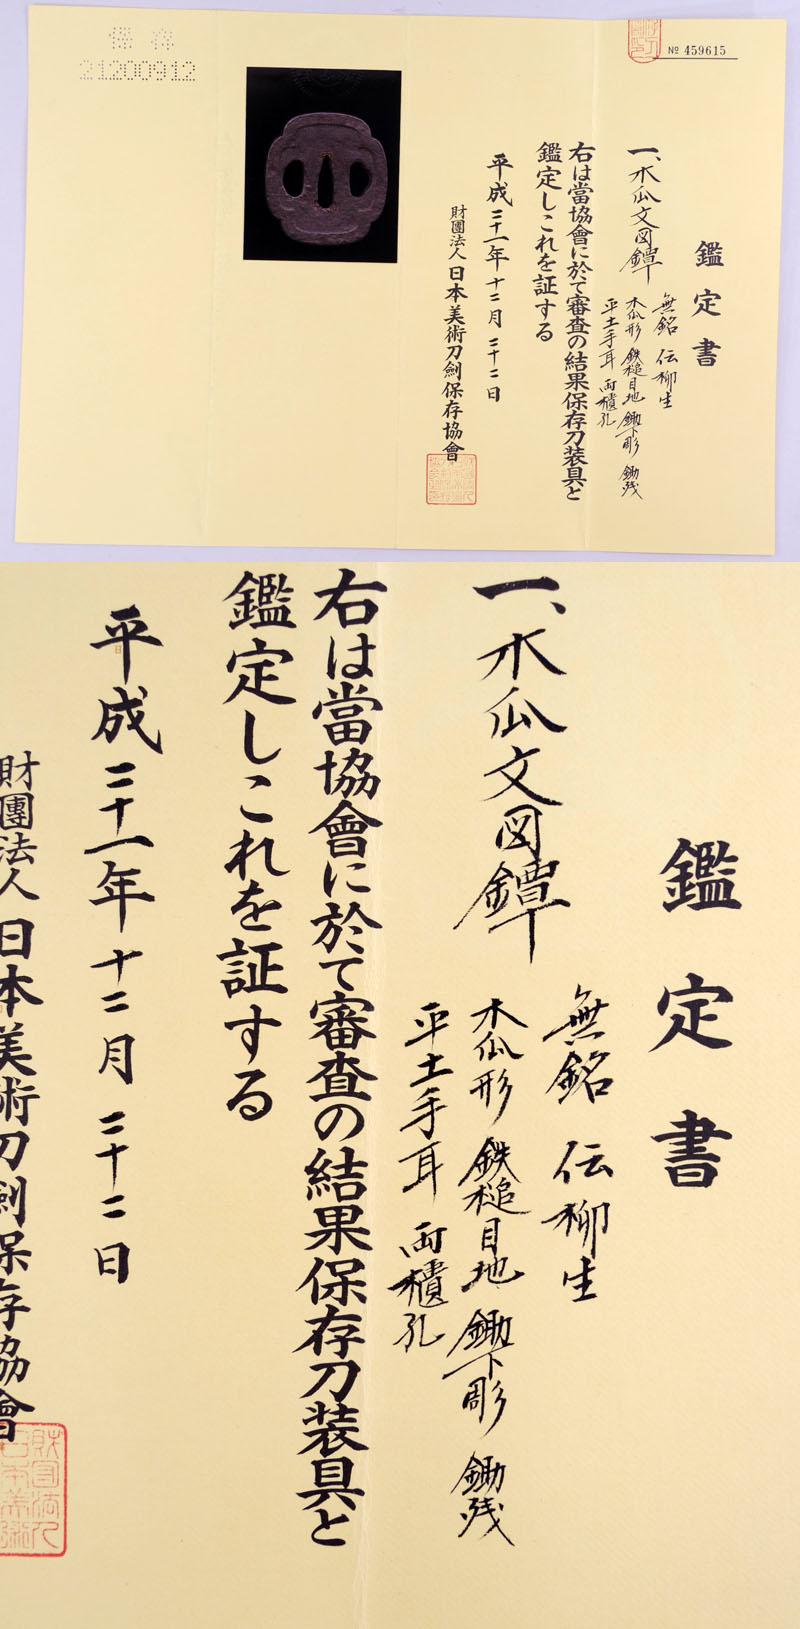 木瓜文図鍔 無銘 伝柳生 Picture of Certificate